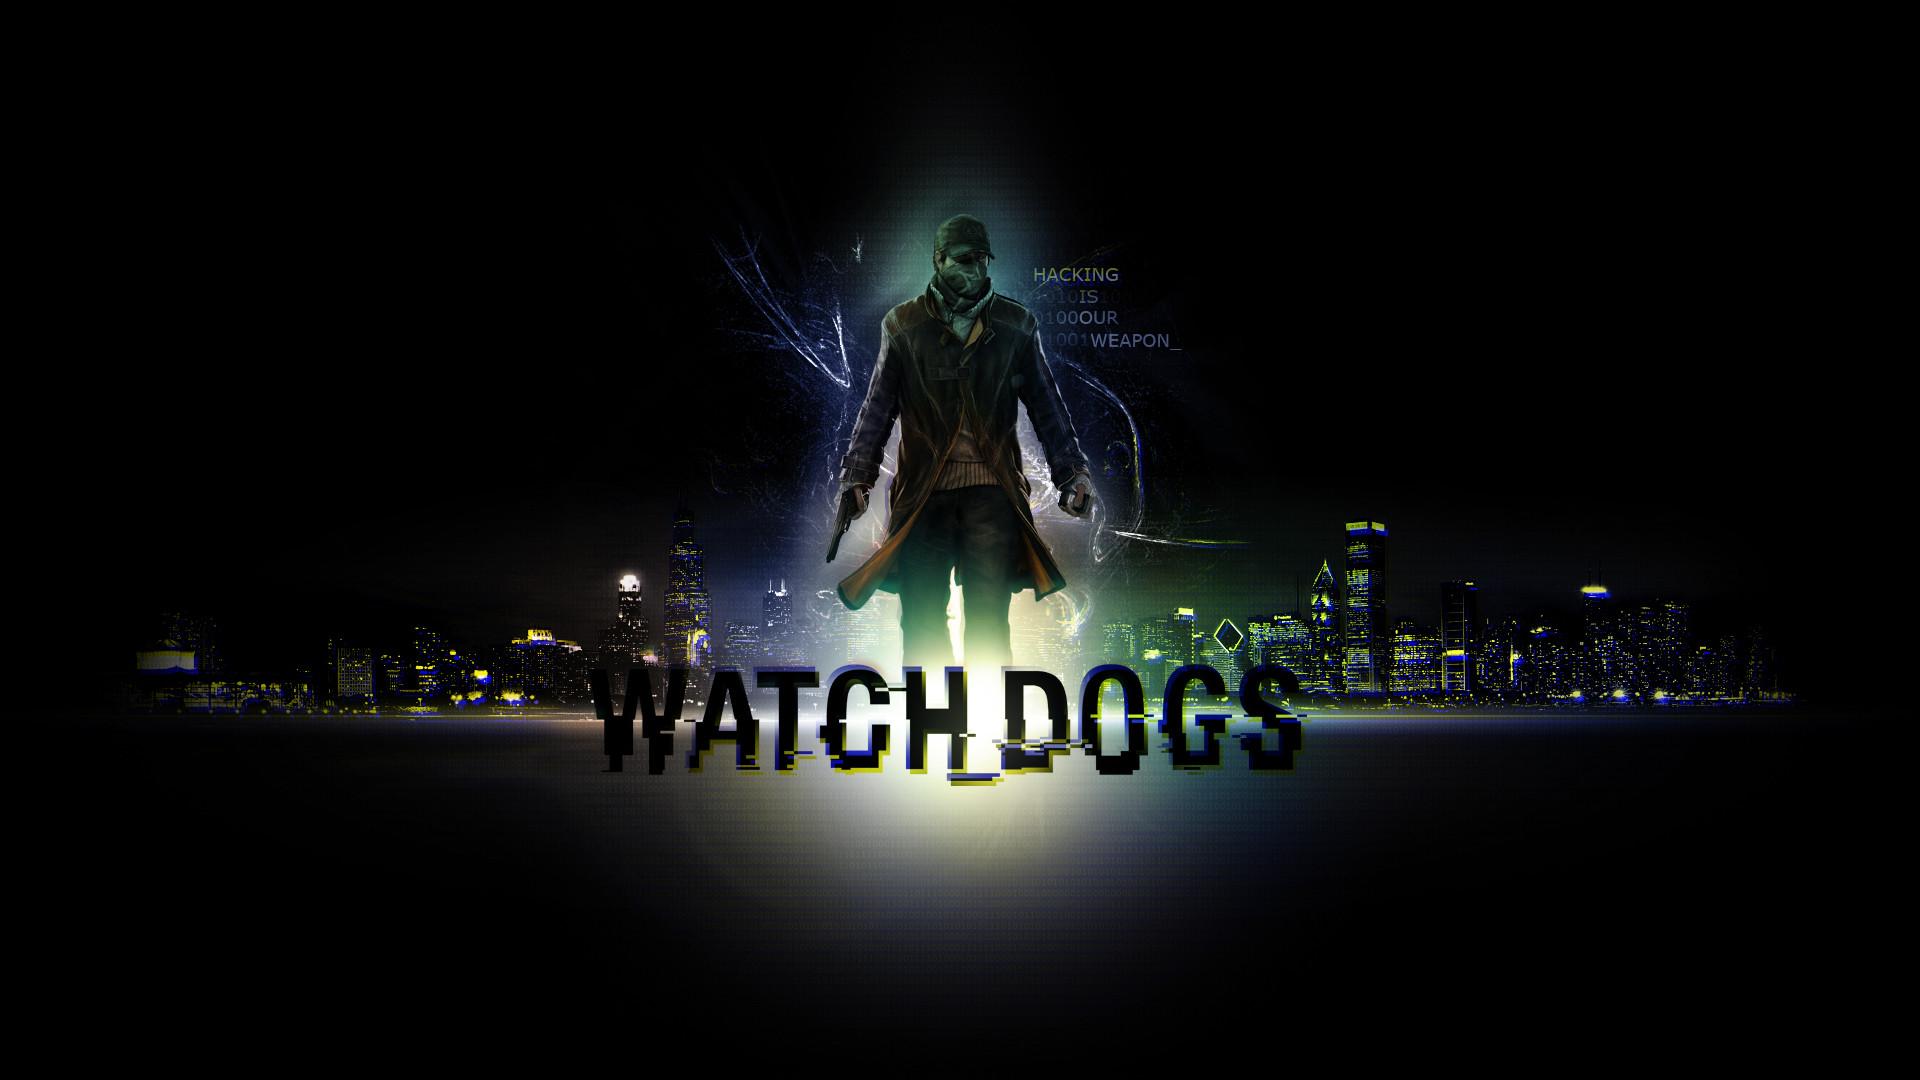 Watch_Dogs wallpaper by RockLou Watch_Dogs wallpaper by RockLou